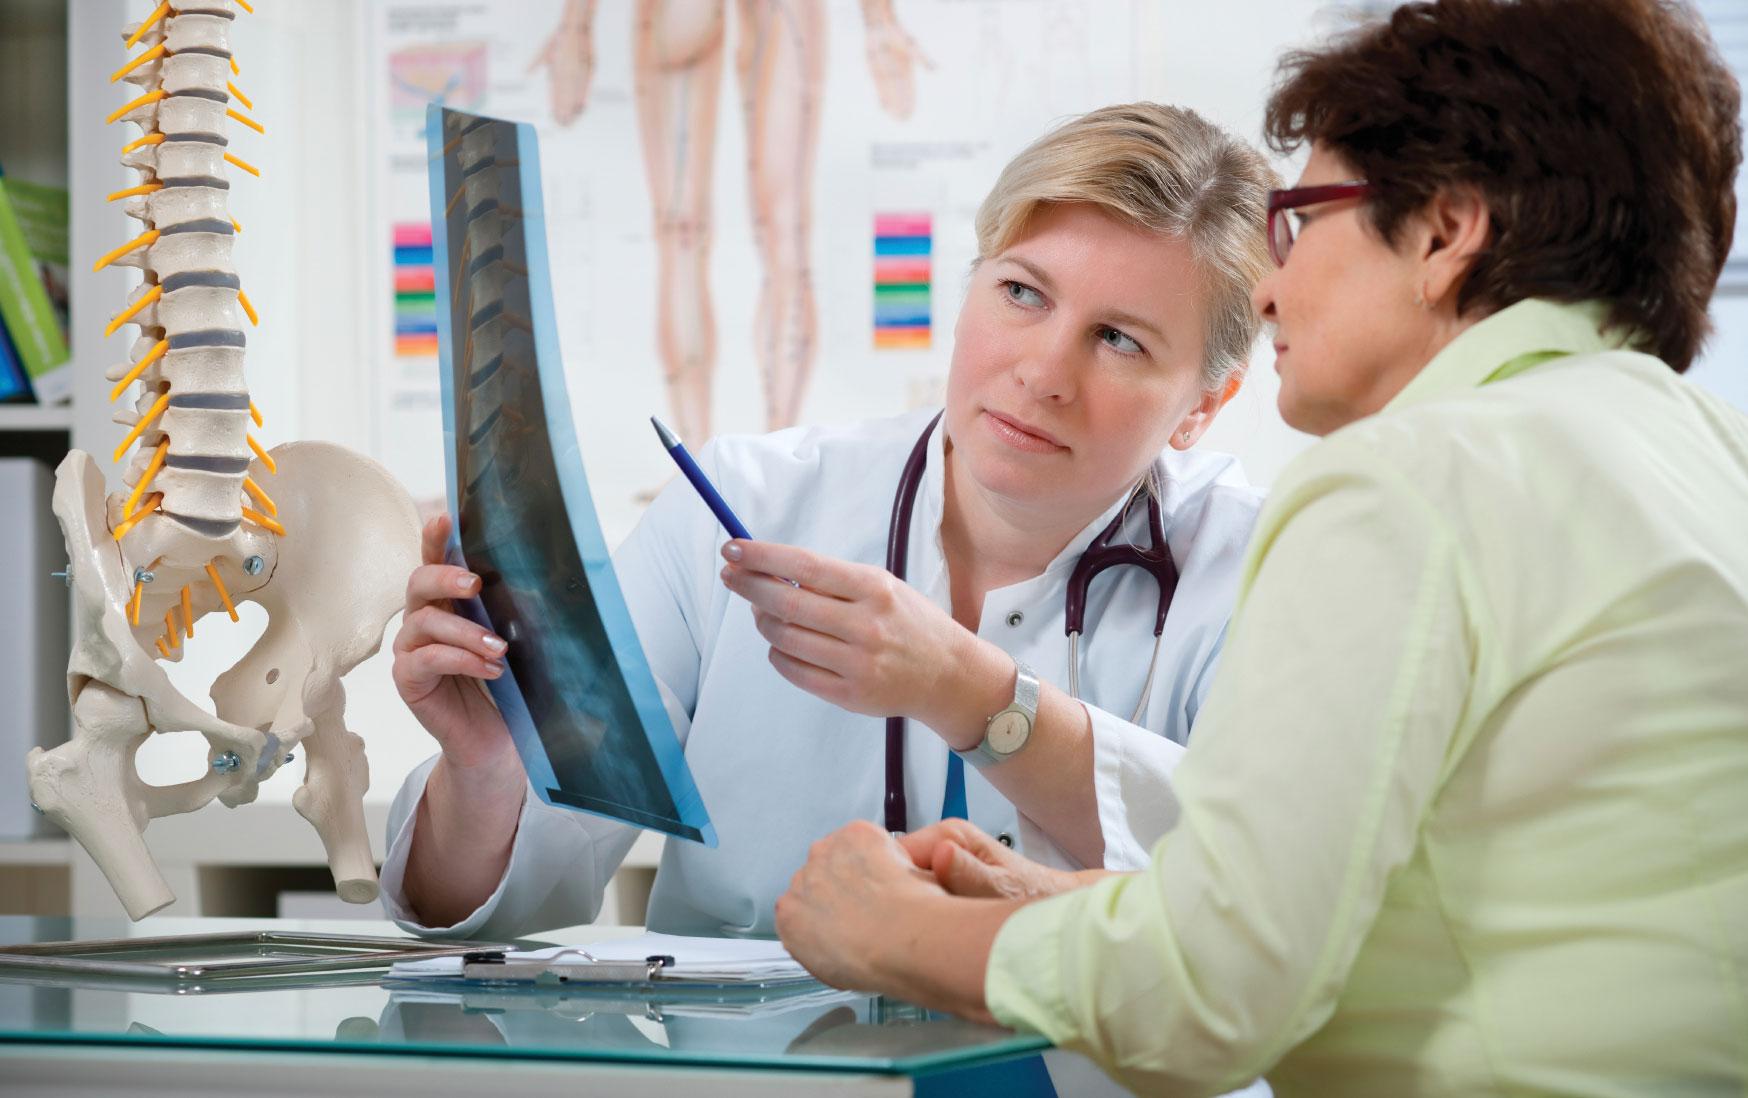 A rheumatologist that treats What a rheumatologist treats in adults 27